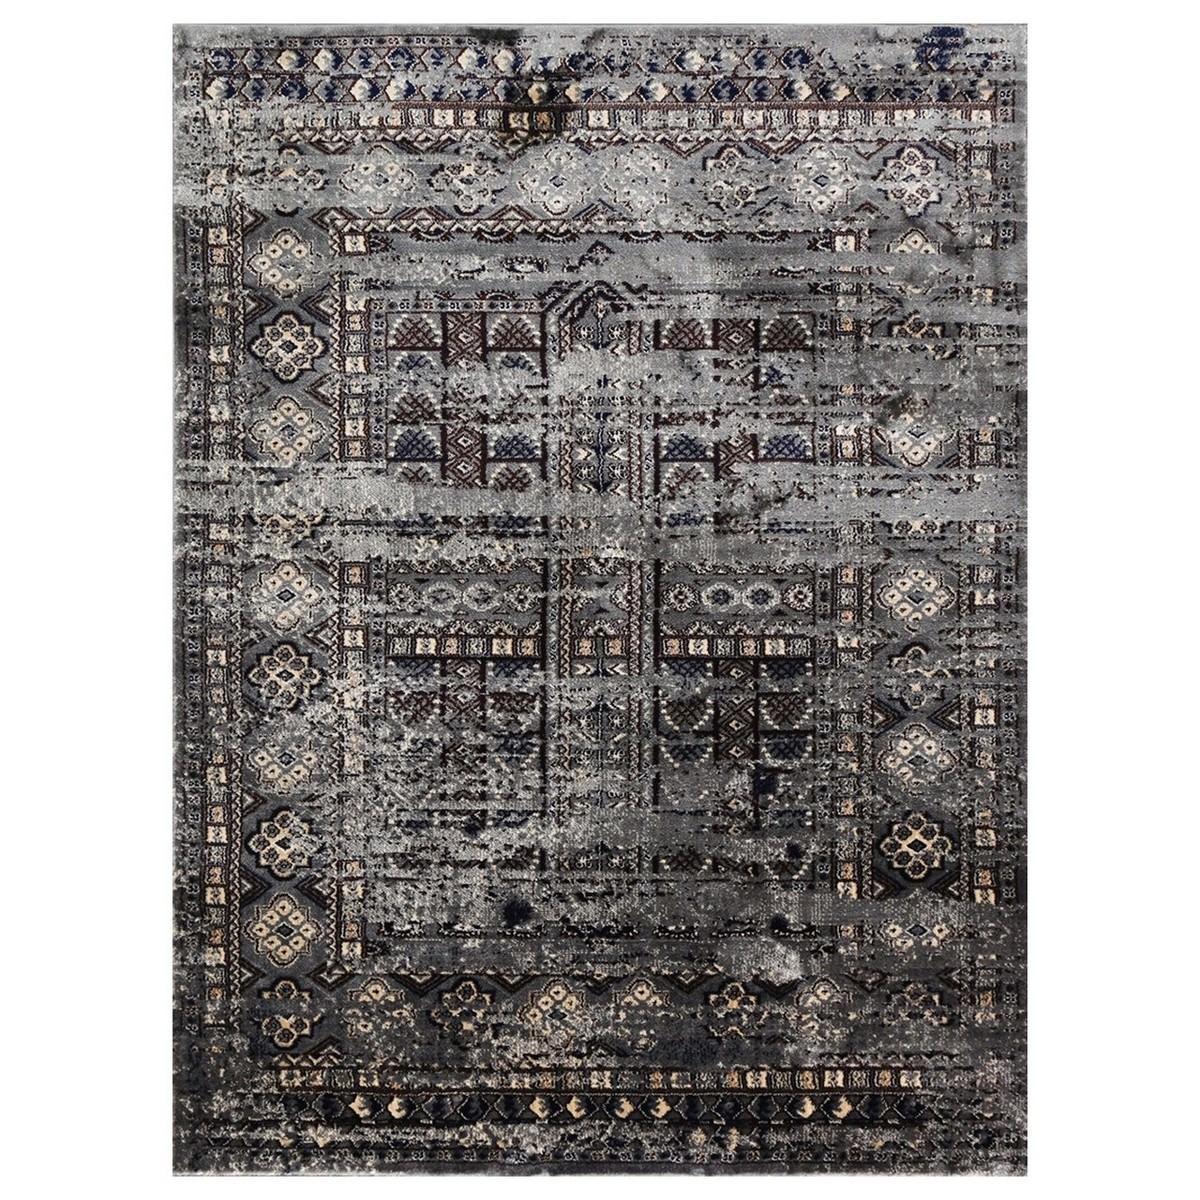 Artifact Ziba Distressed Oriental Rug, 120x170cm